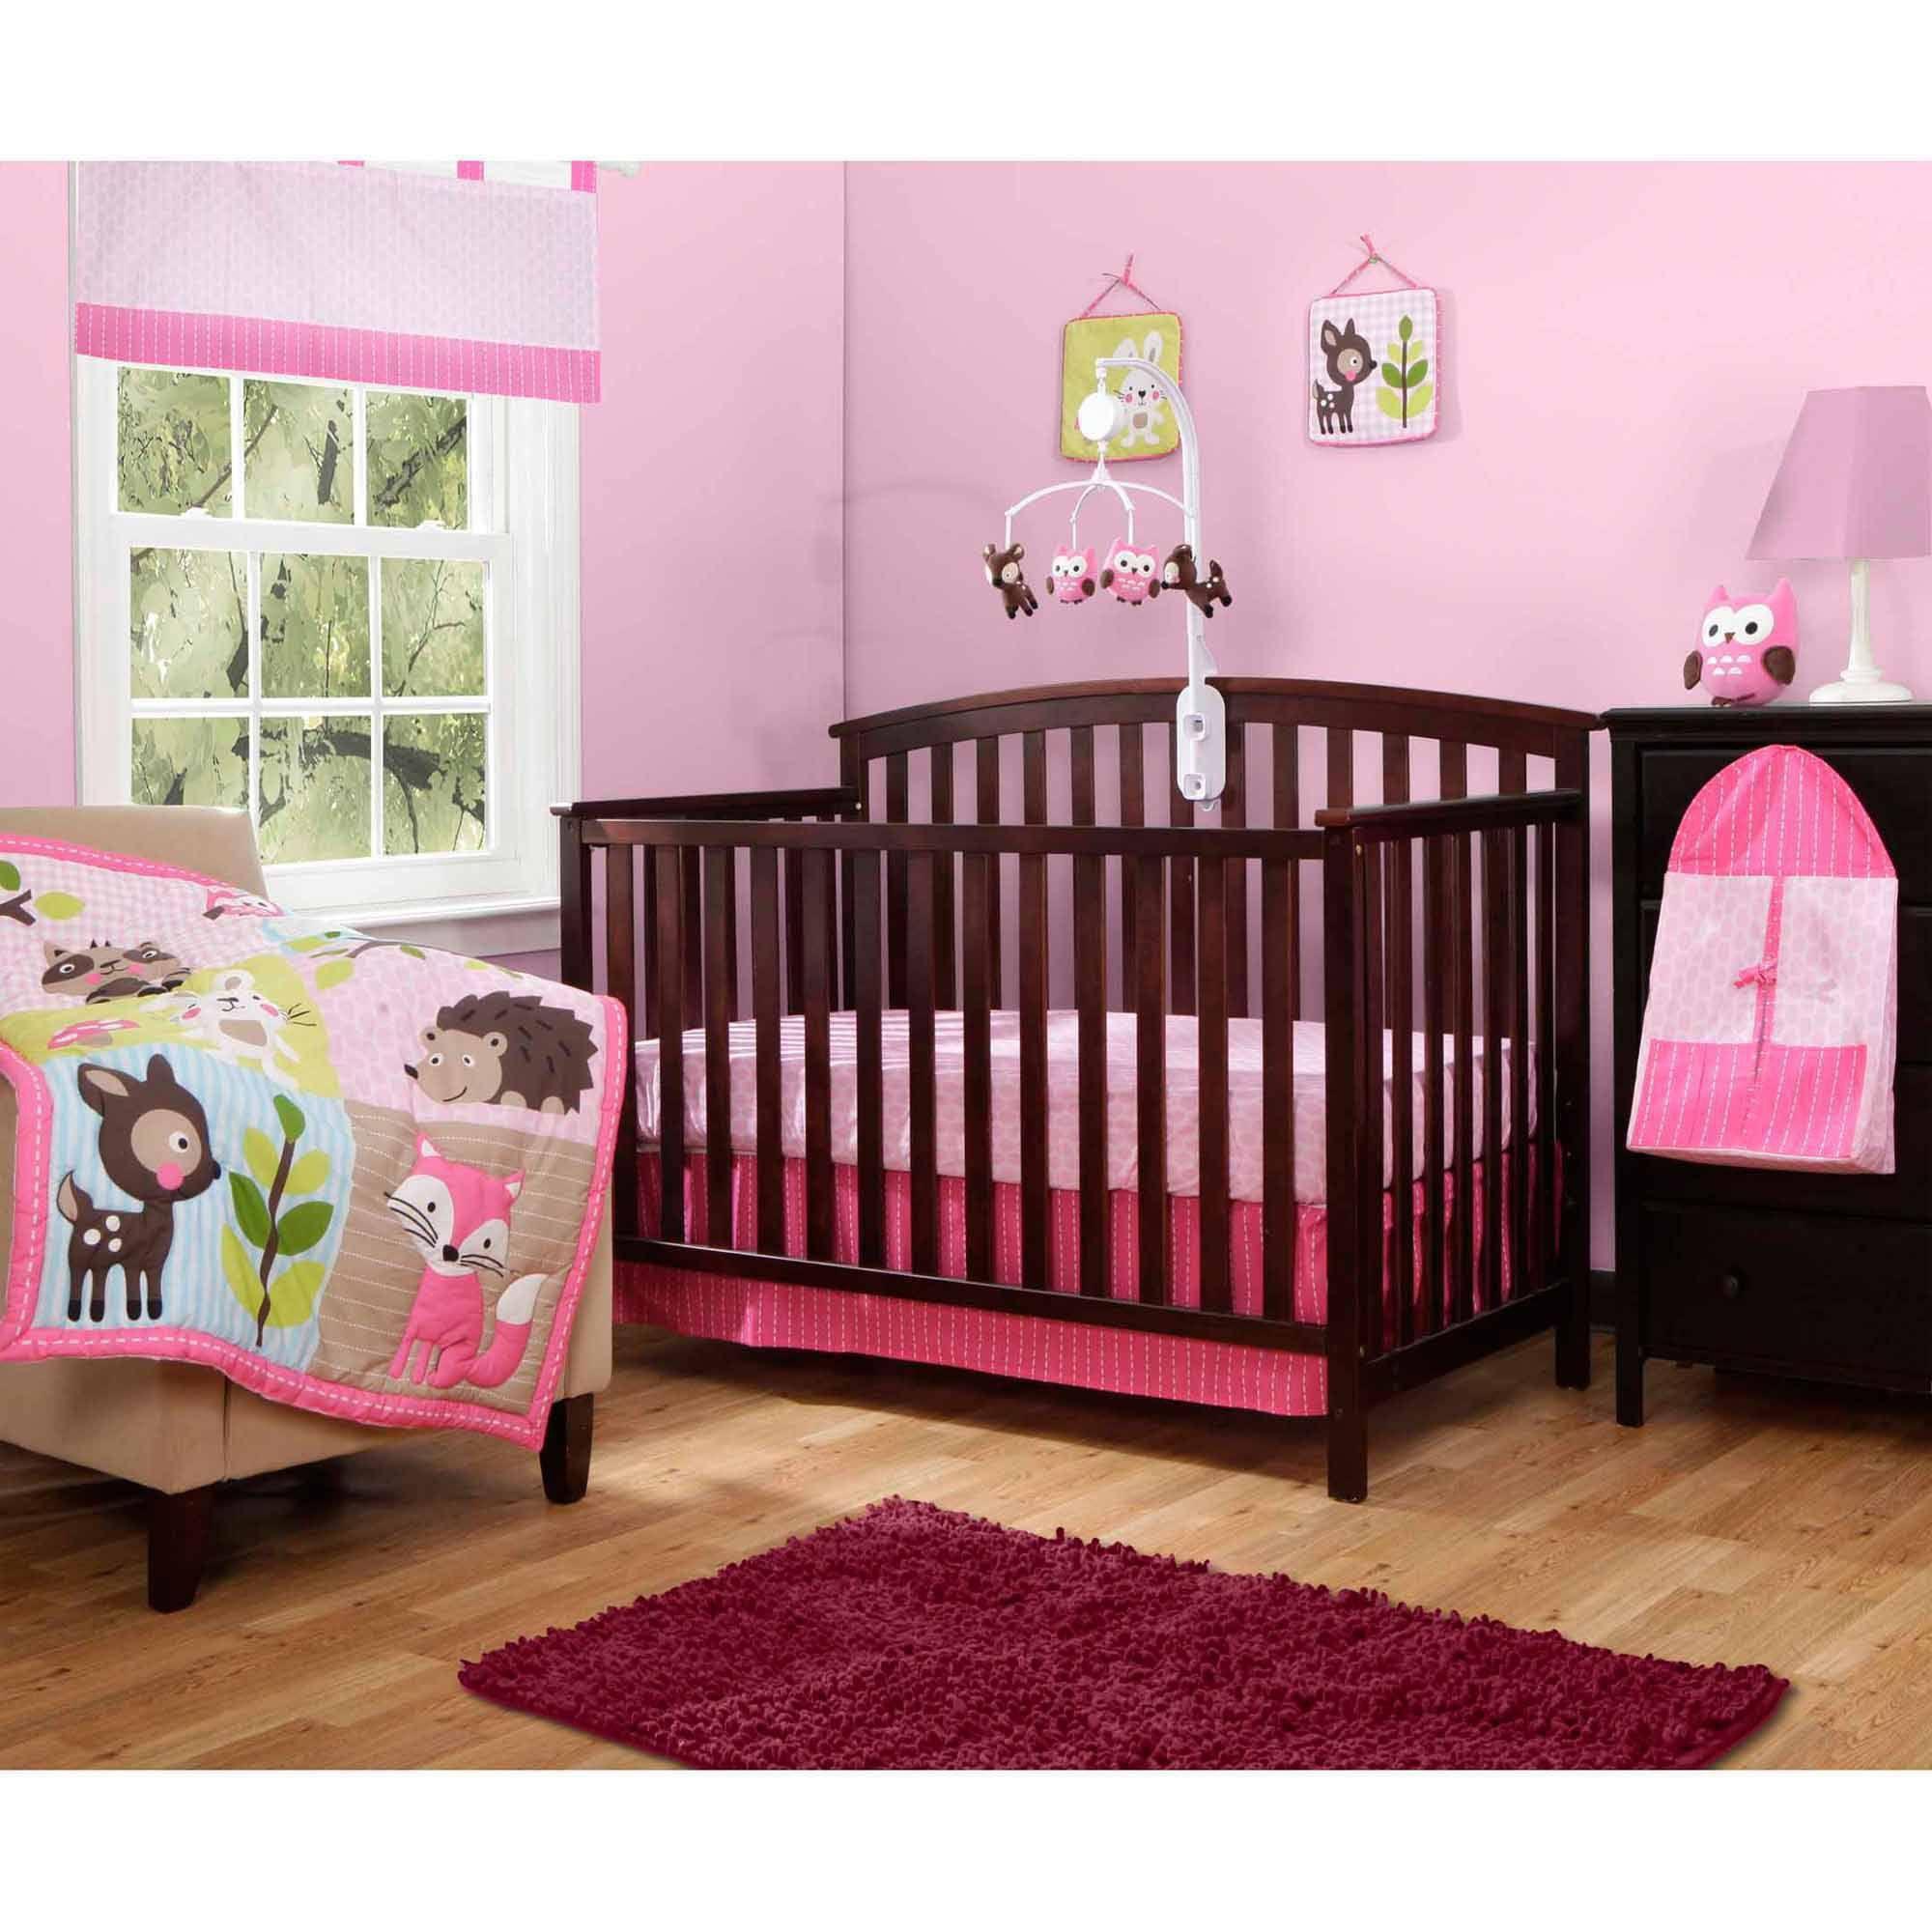 Baby Boom Woodland Girl 10-piece Crib Bedding Set